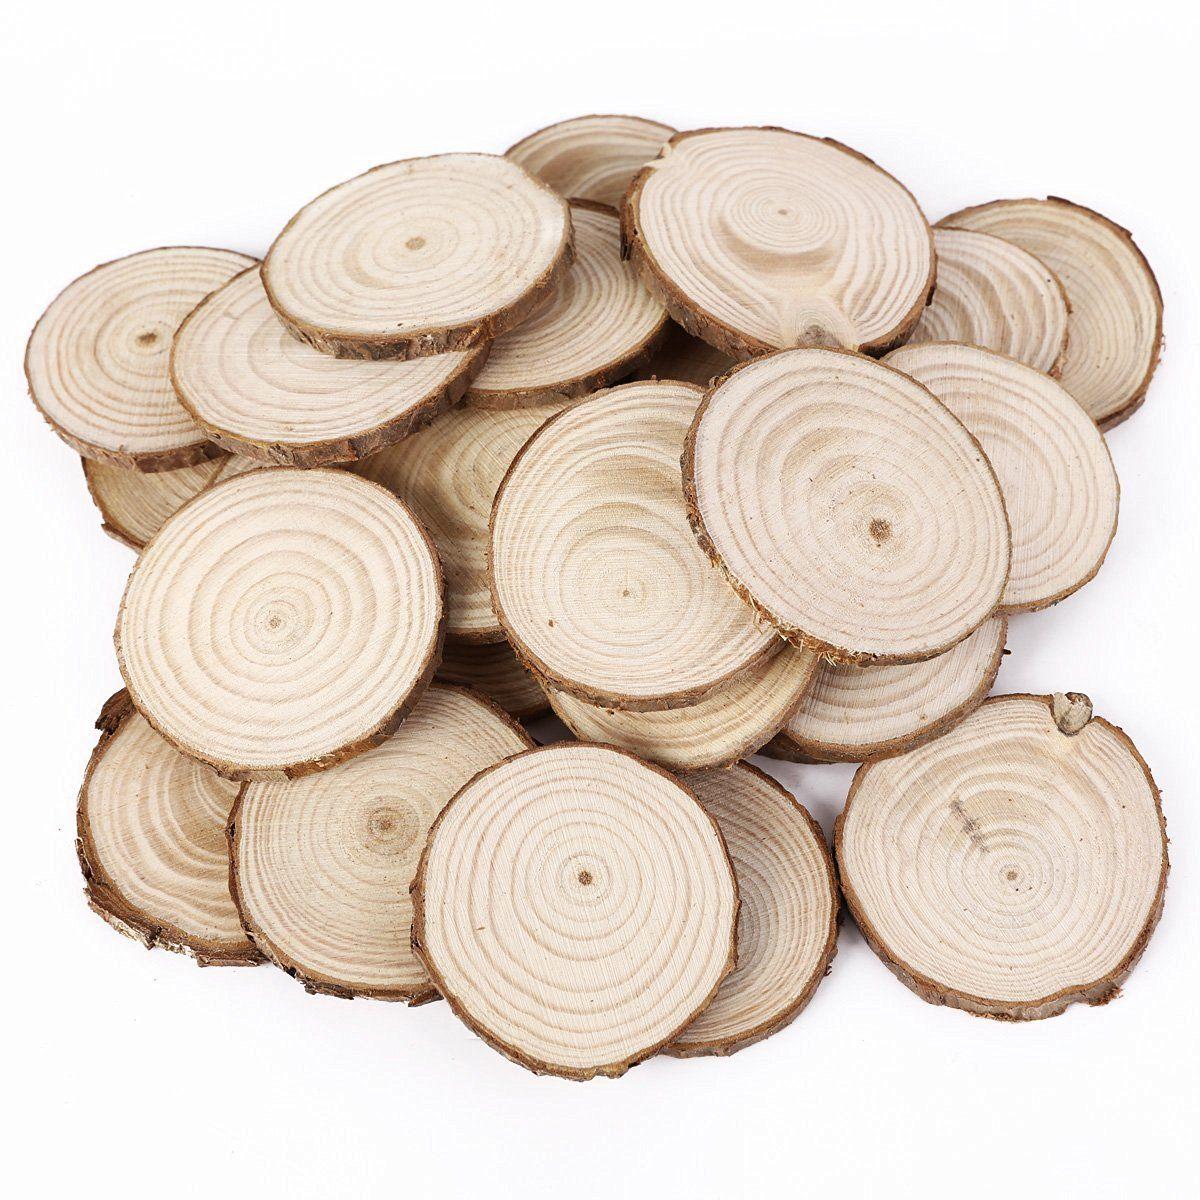 25PCS 5CM Wooden Wood Log Slices Discs Natural Tree Bark Table ...